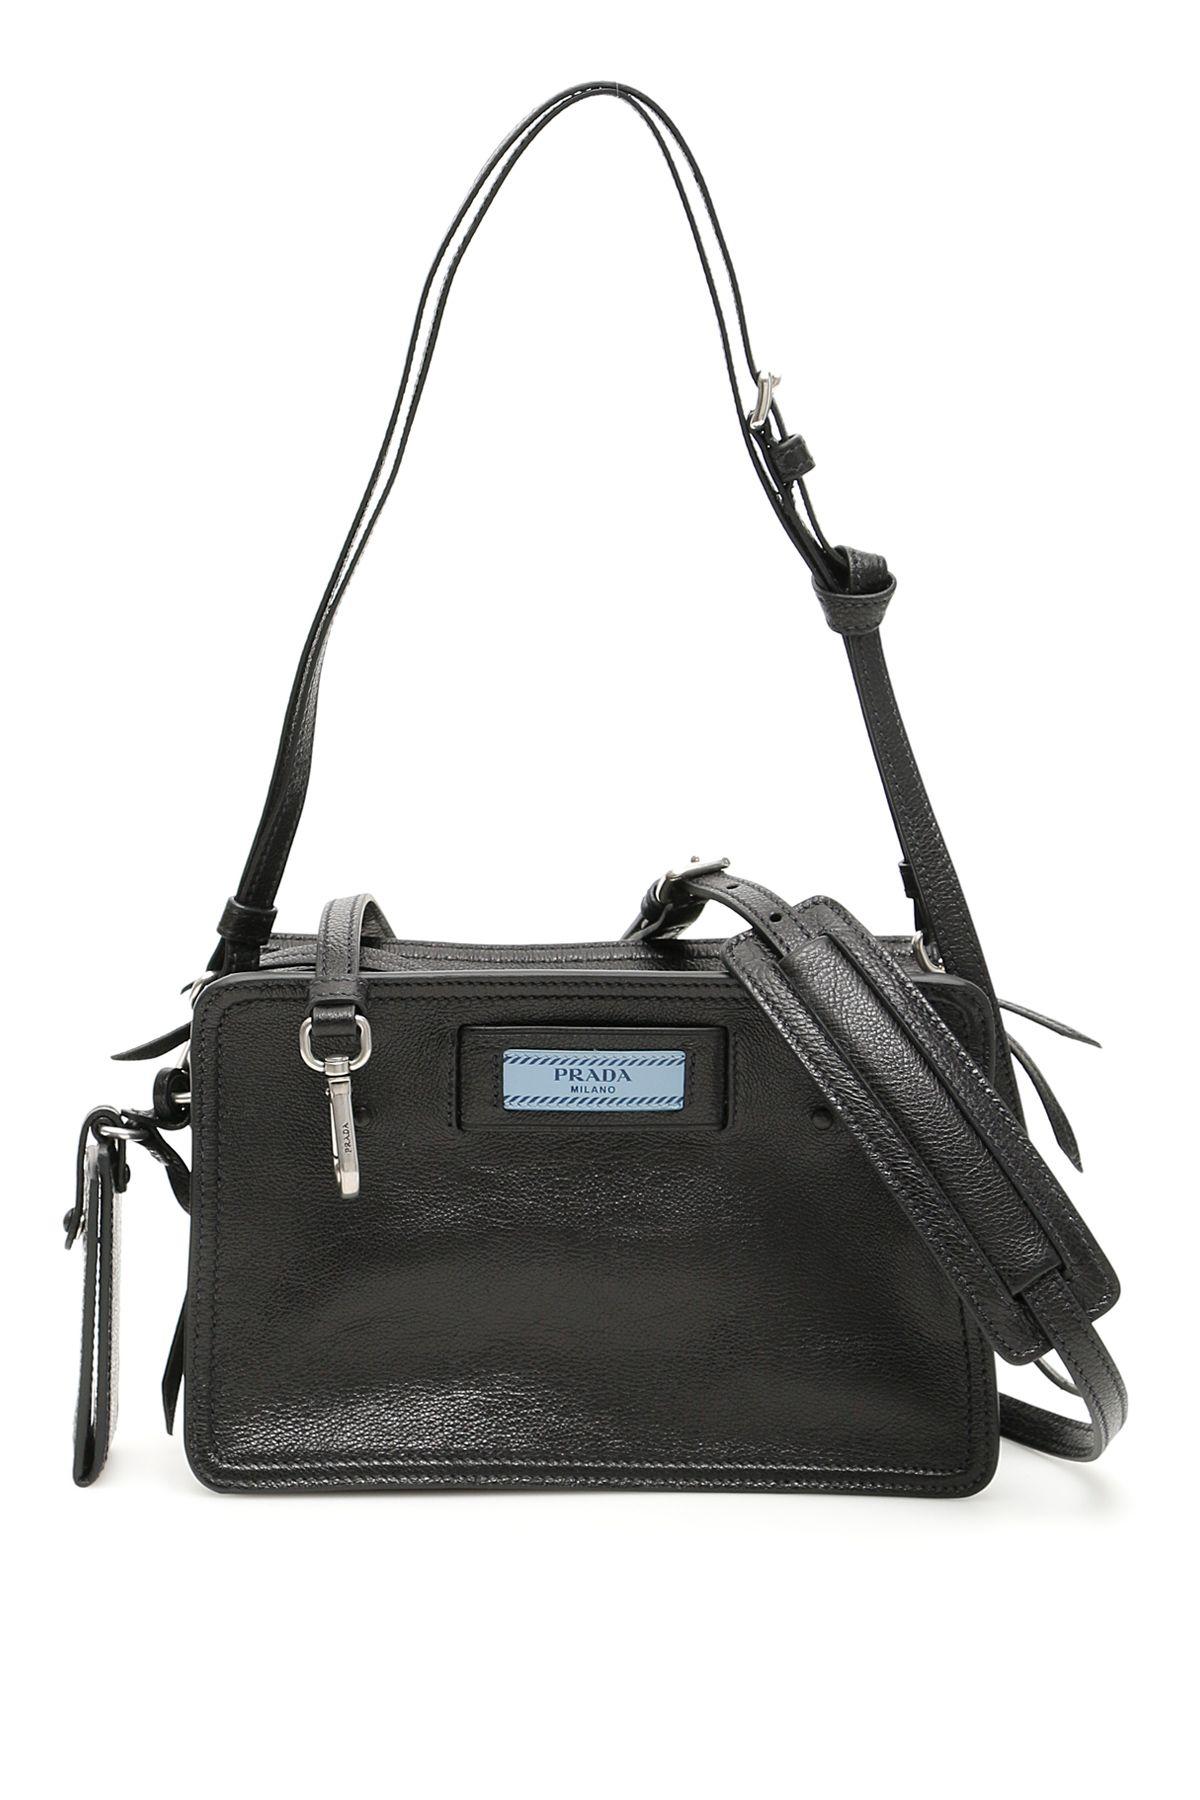 9e6c87618fec Prada Prada Etiquette Logo Camera Bag - NERO ASTRALE (Black ...